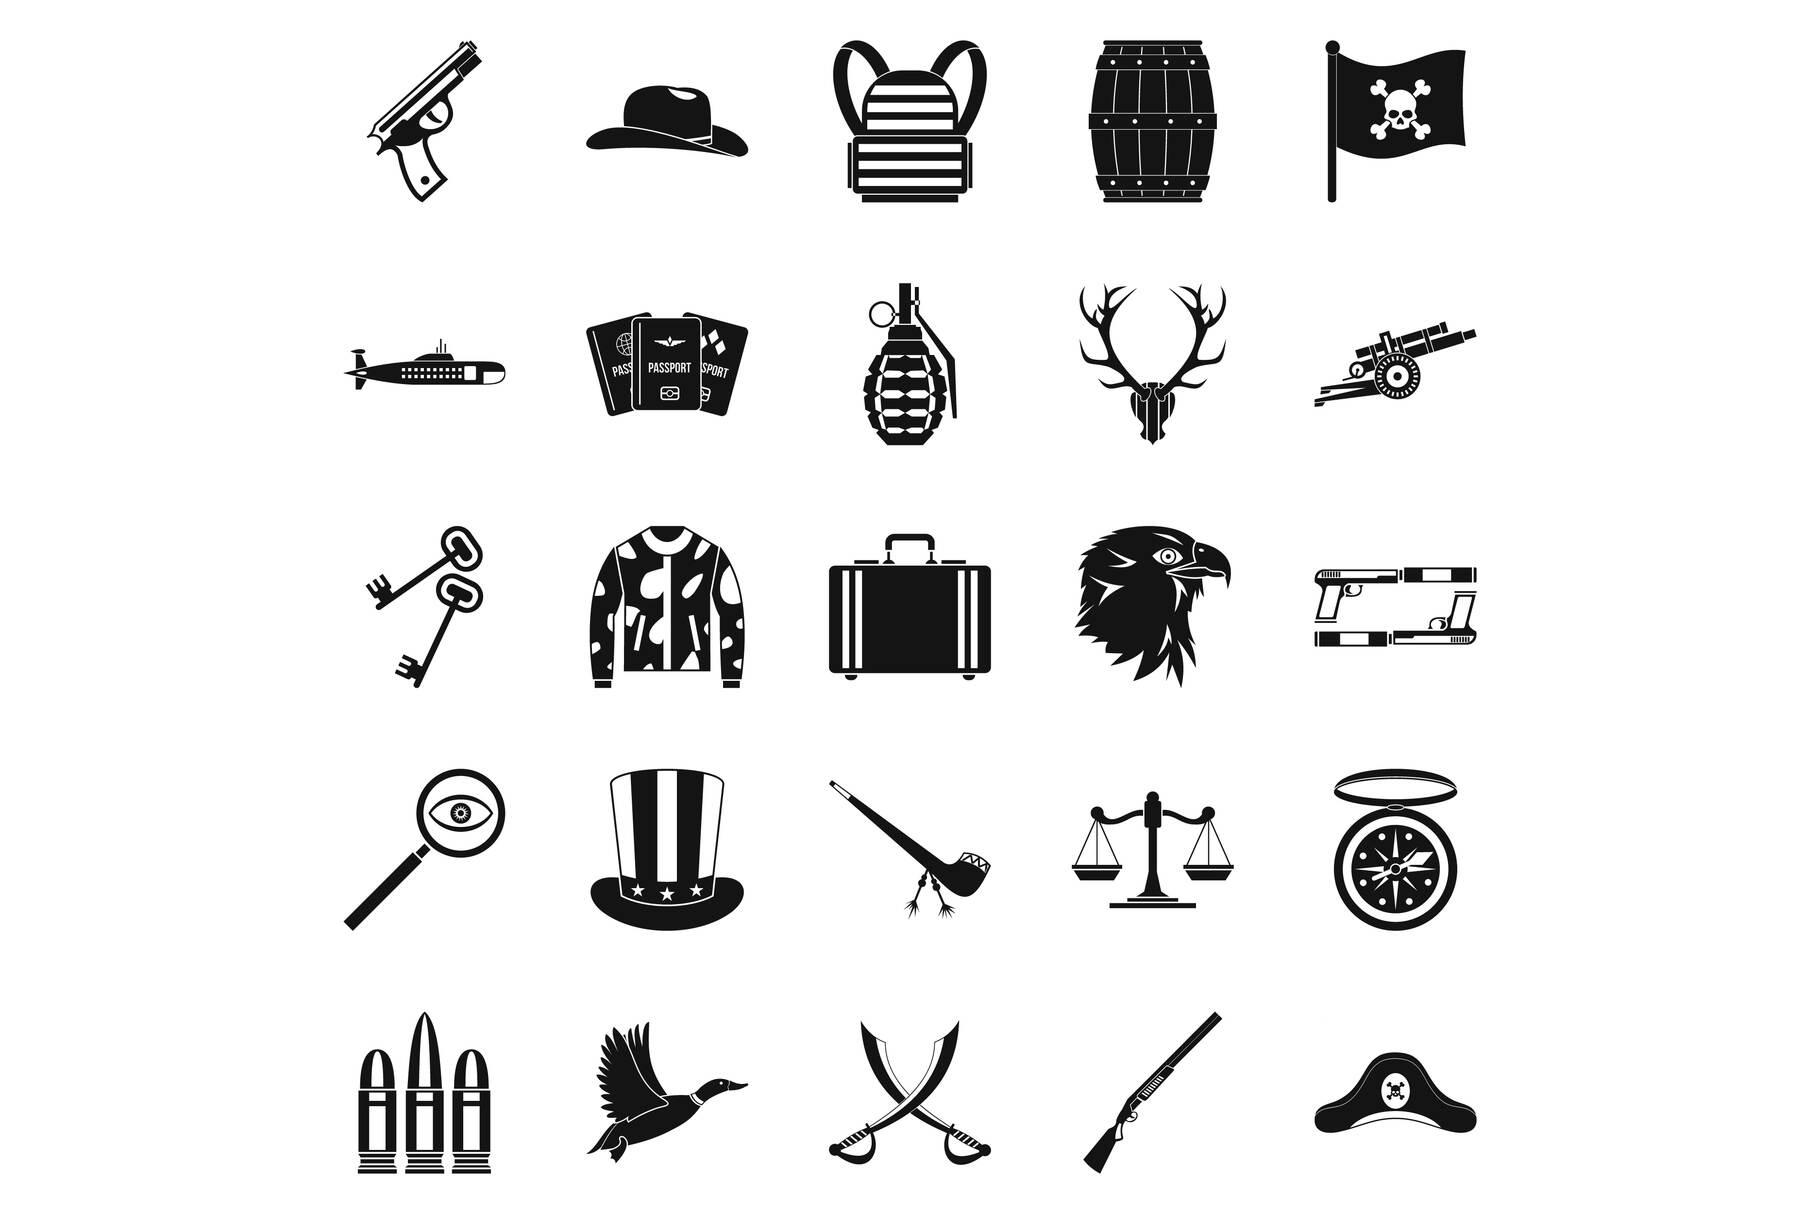 Slug icons set, simple style example image 1